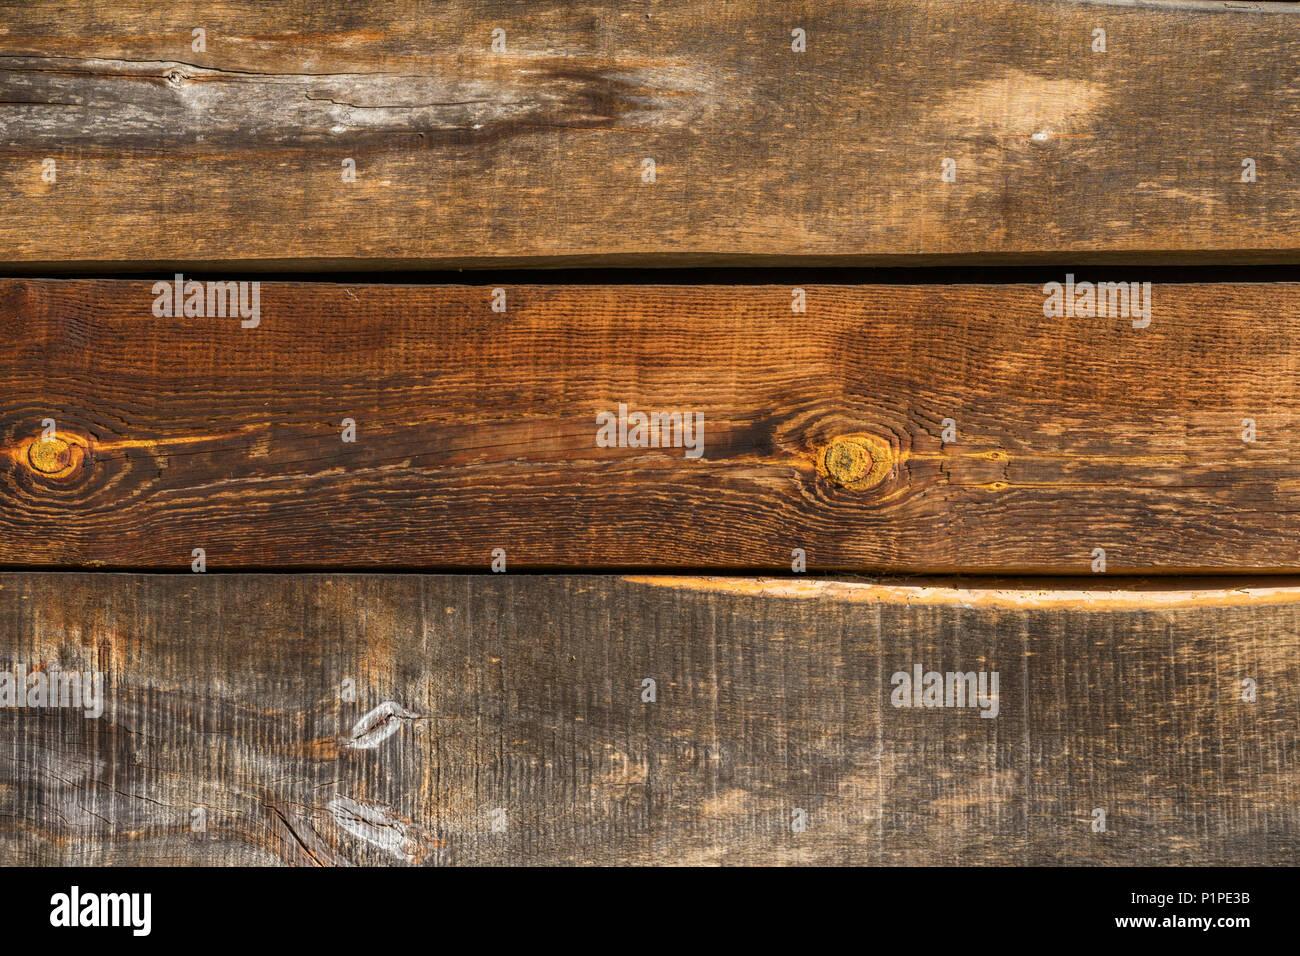 natürliche holzoberfläche, textur close-up. rustikal horizontalen